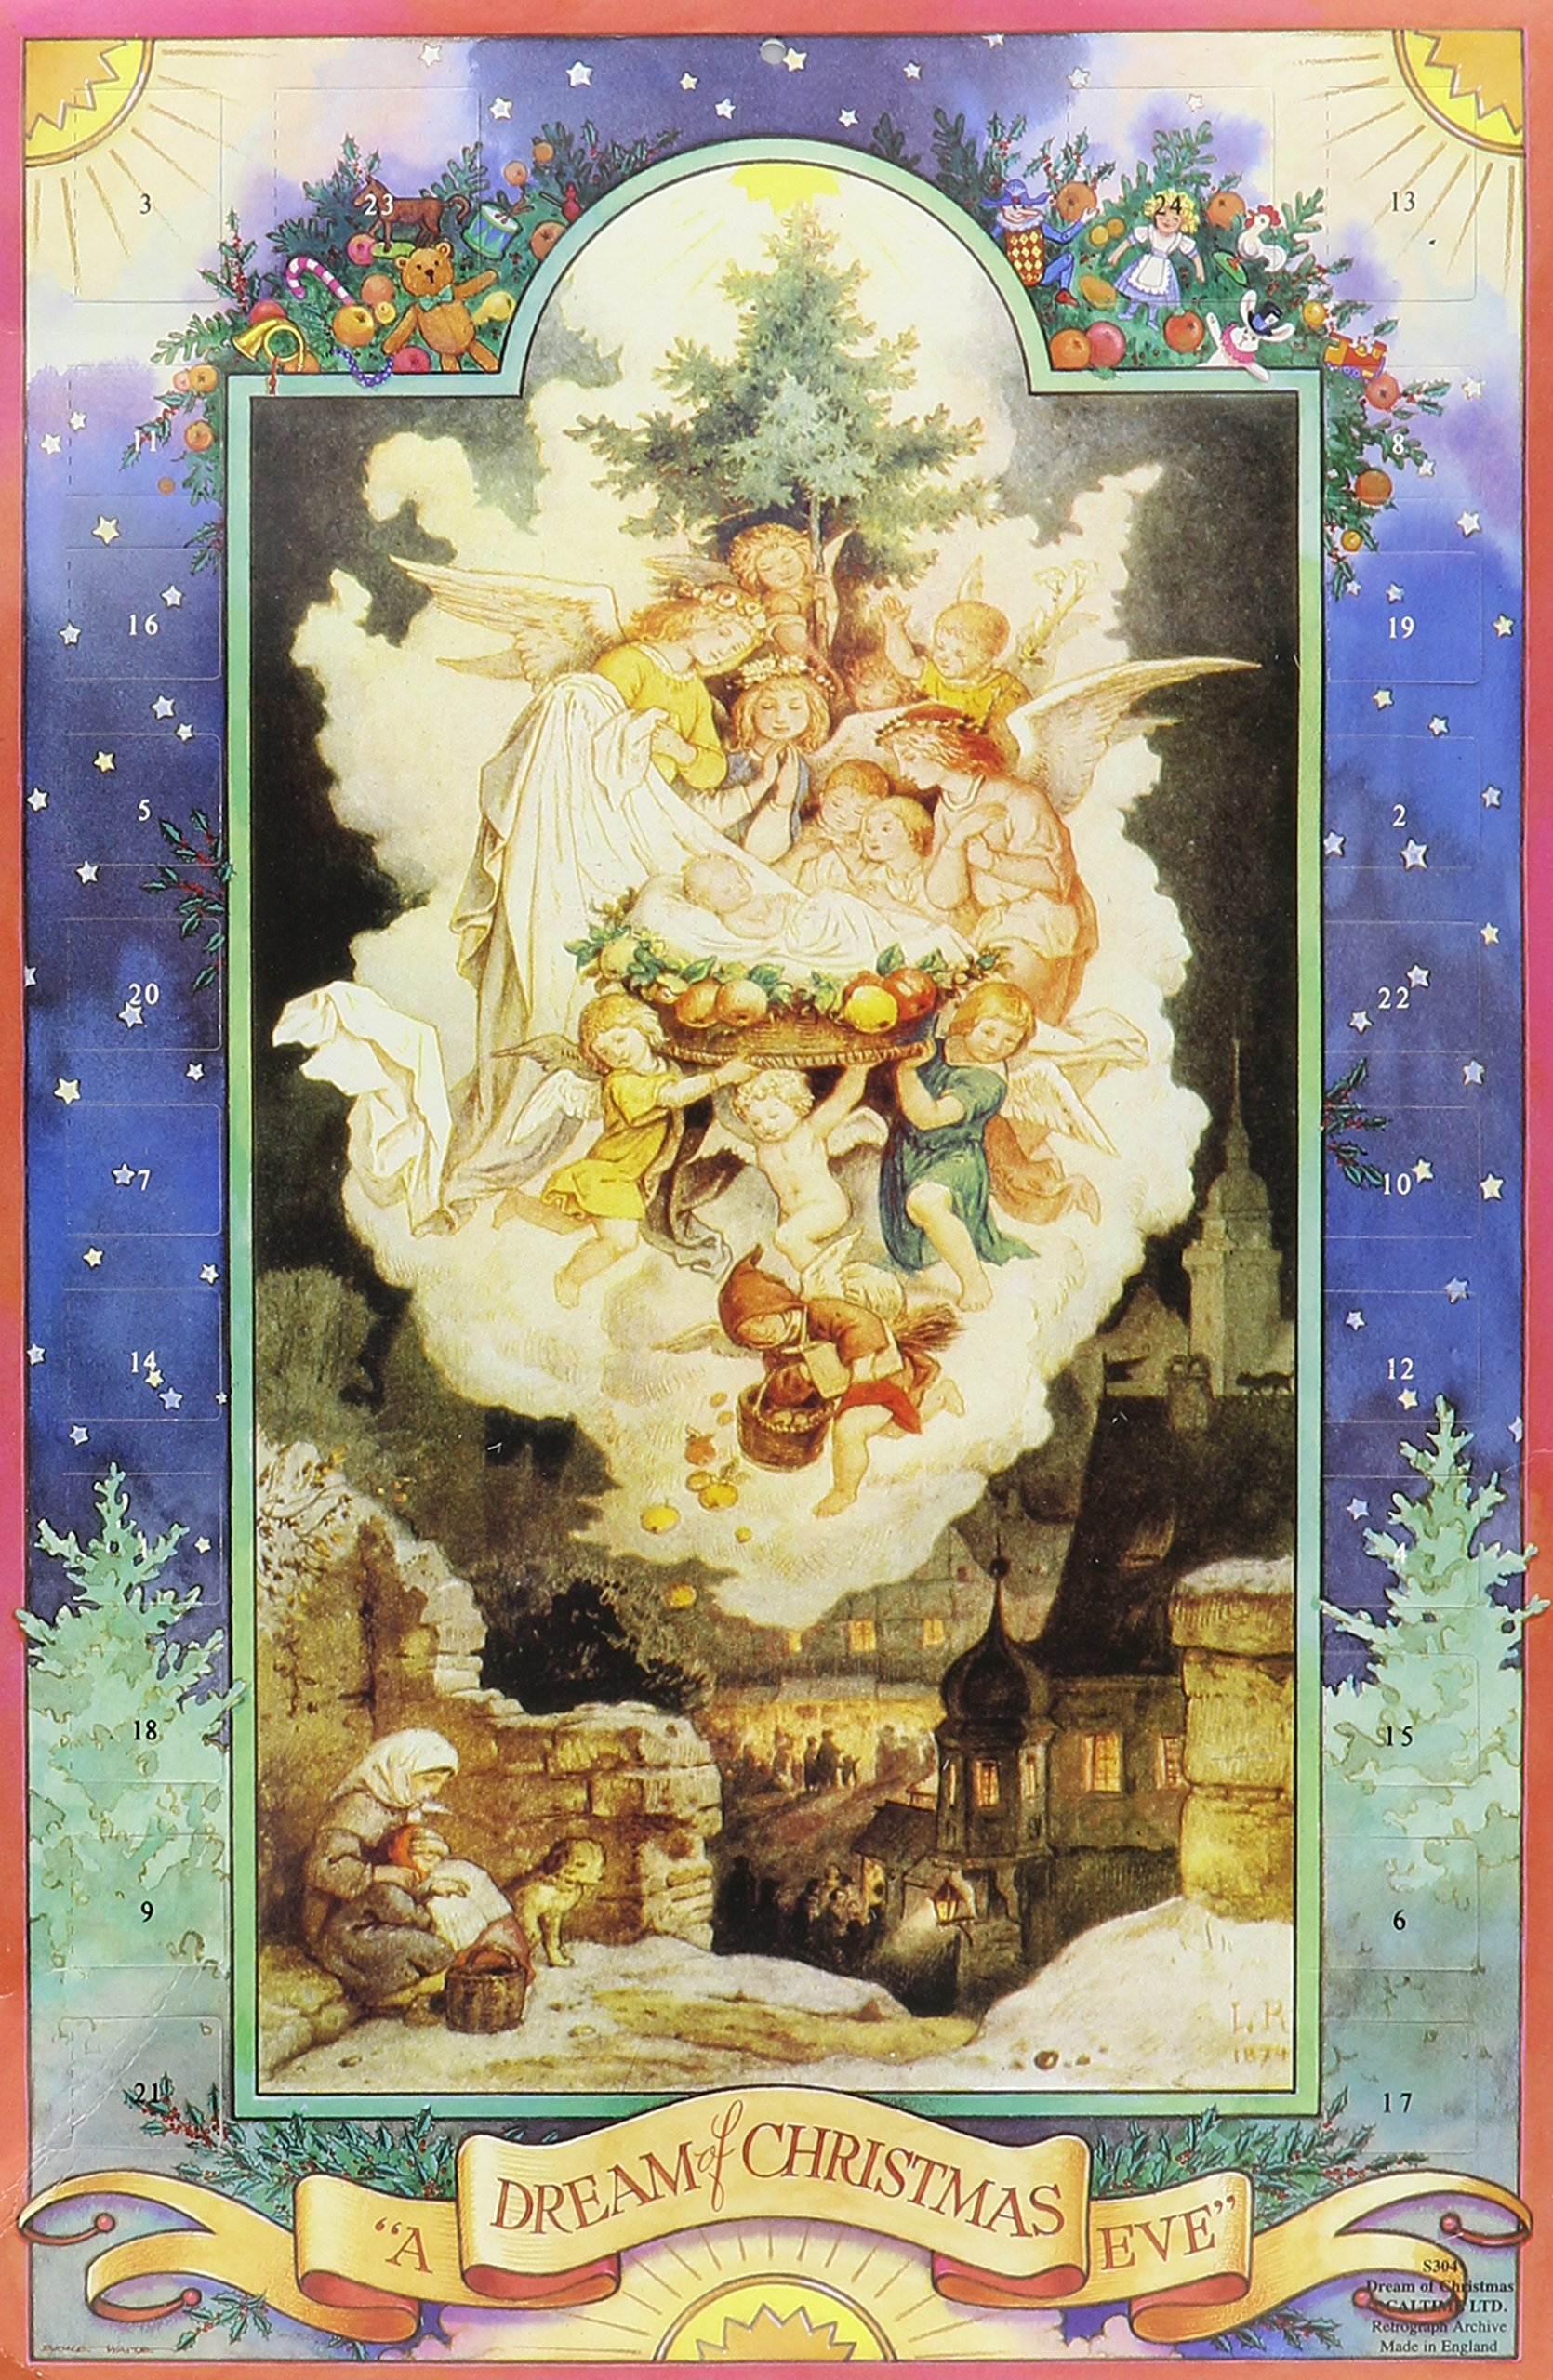 A Dream Of Christmas.A Dream Of Christmas Eve Advent Calendar 9 25 X 15 75